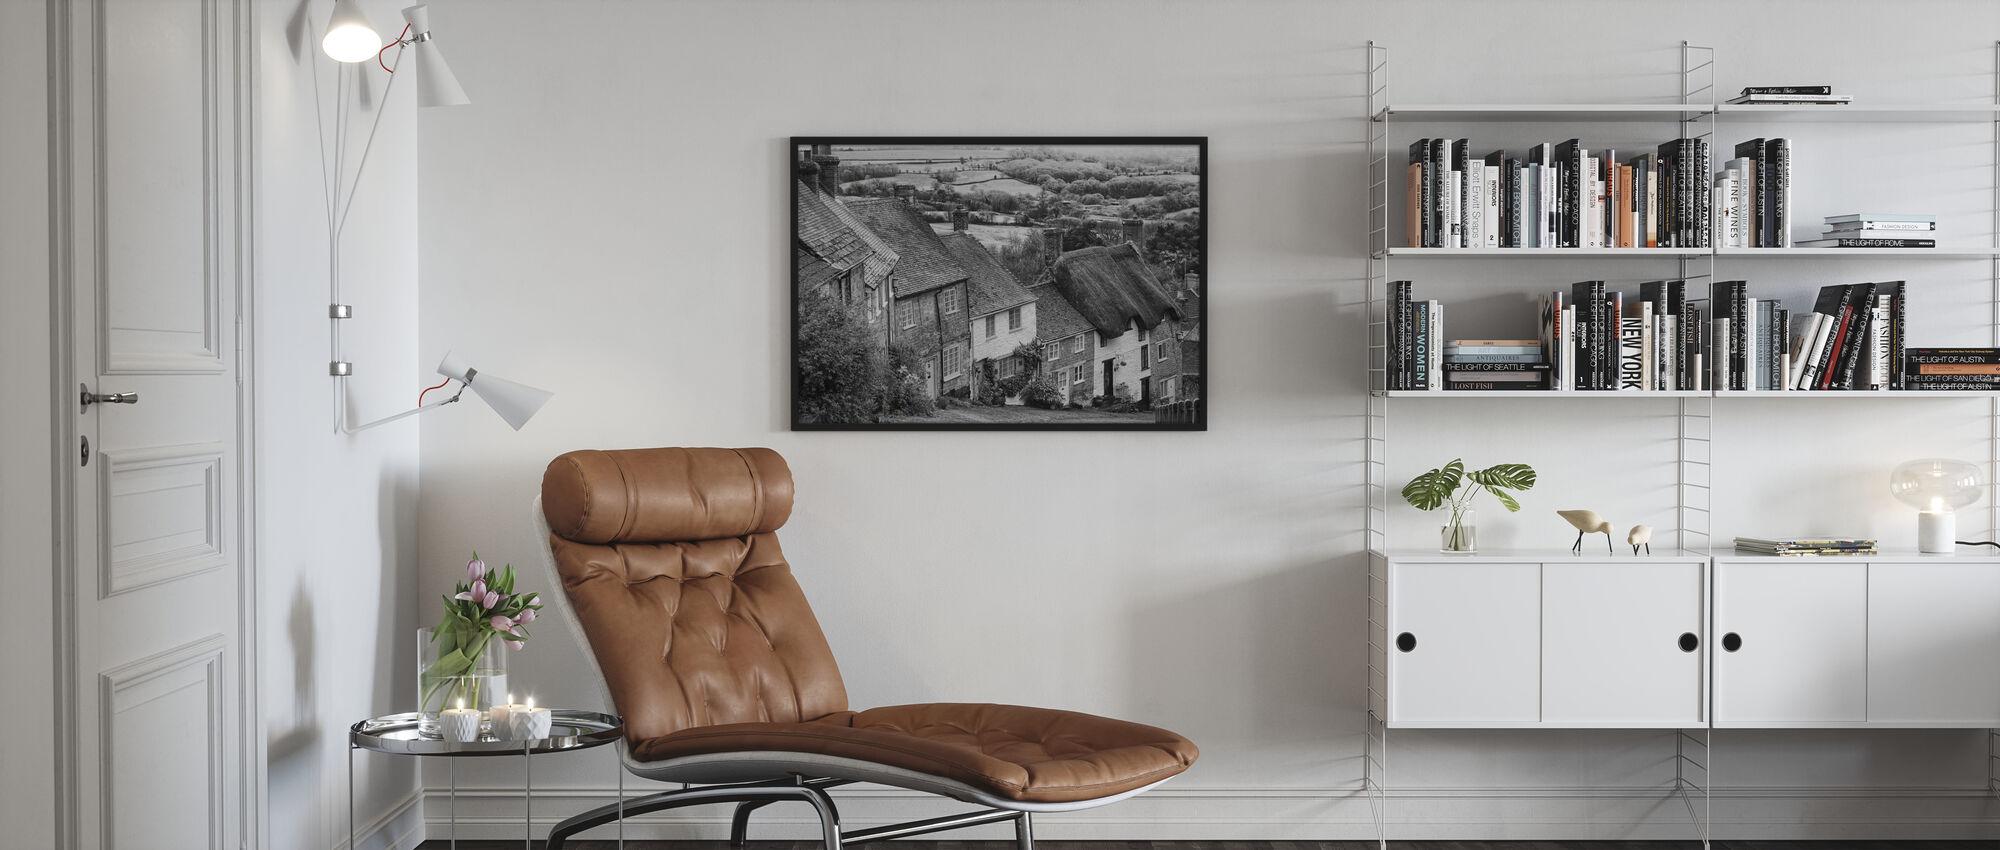 Gold Hill Shaftsbury Somerset - Poster - Living Room